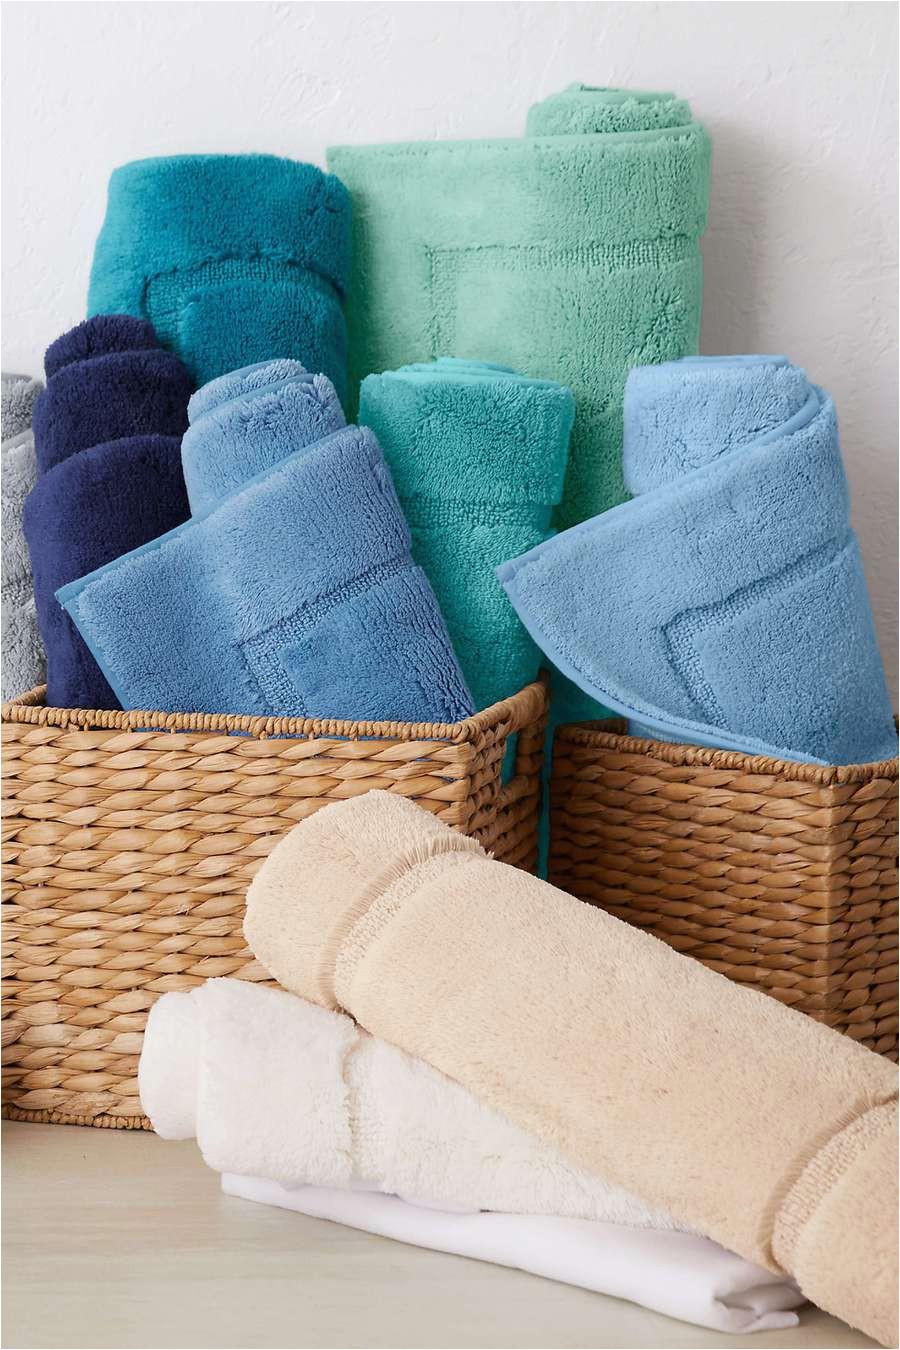 supima cotton mat a dc4a61b f269dc1a2b